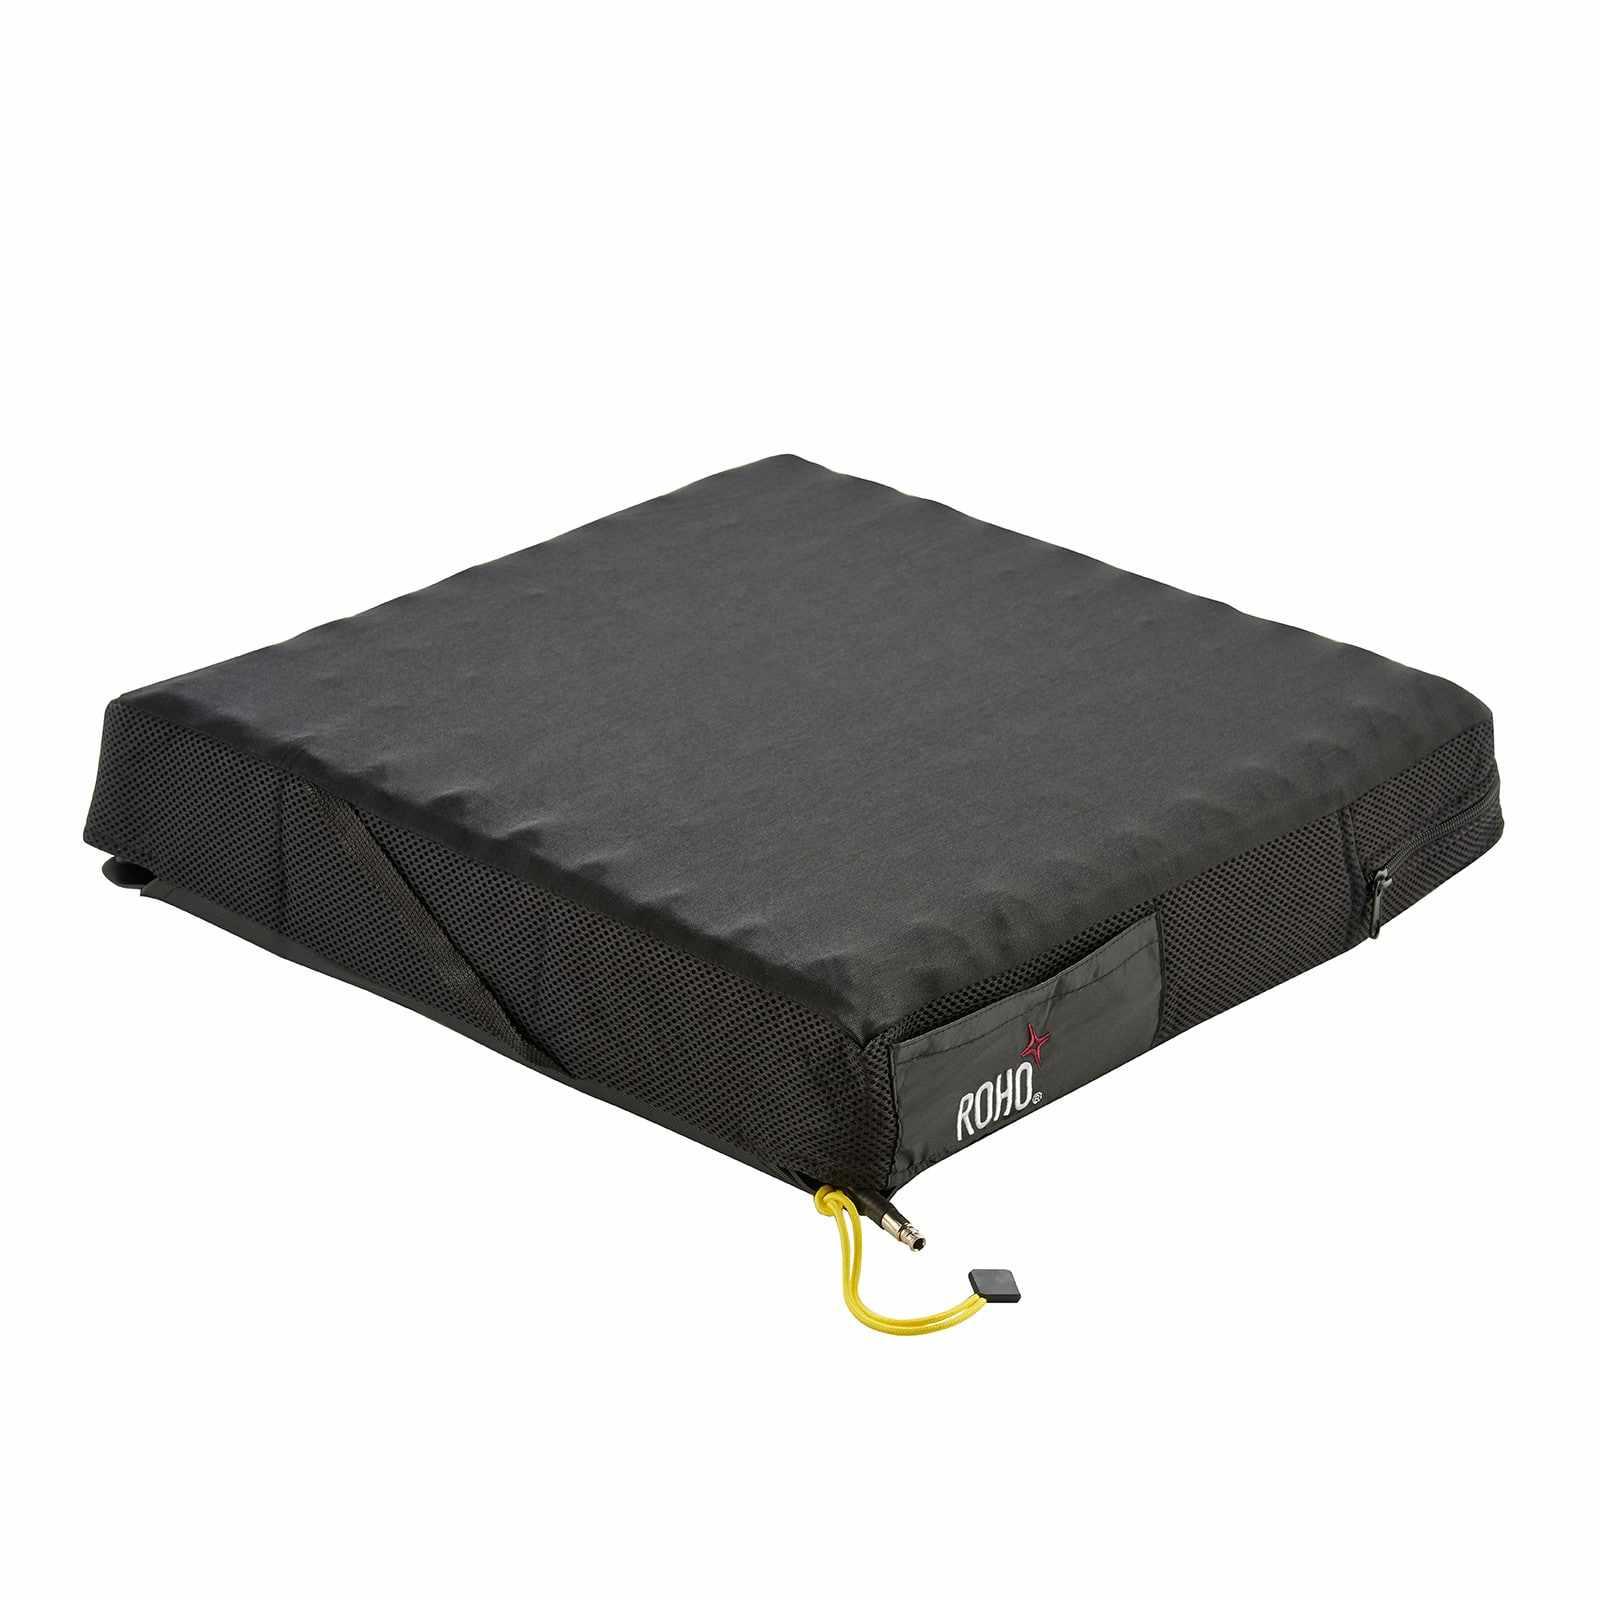 Roho High Profile Sensor Ready cushion with cover